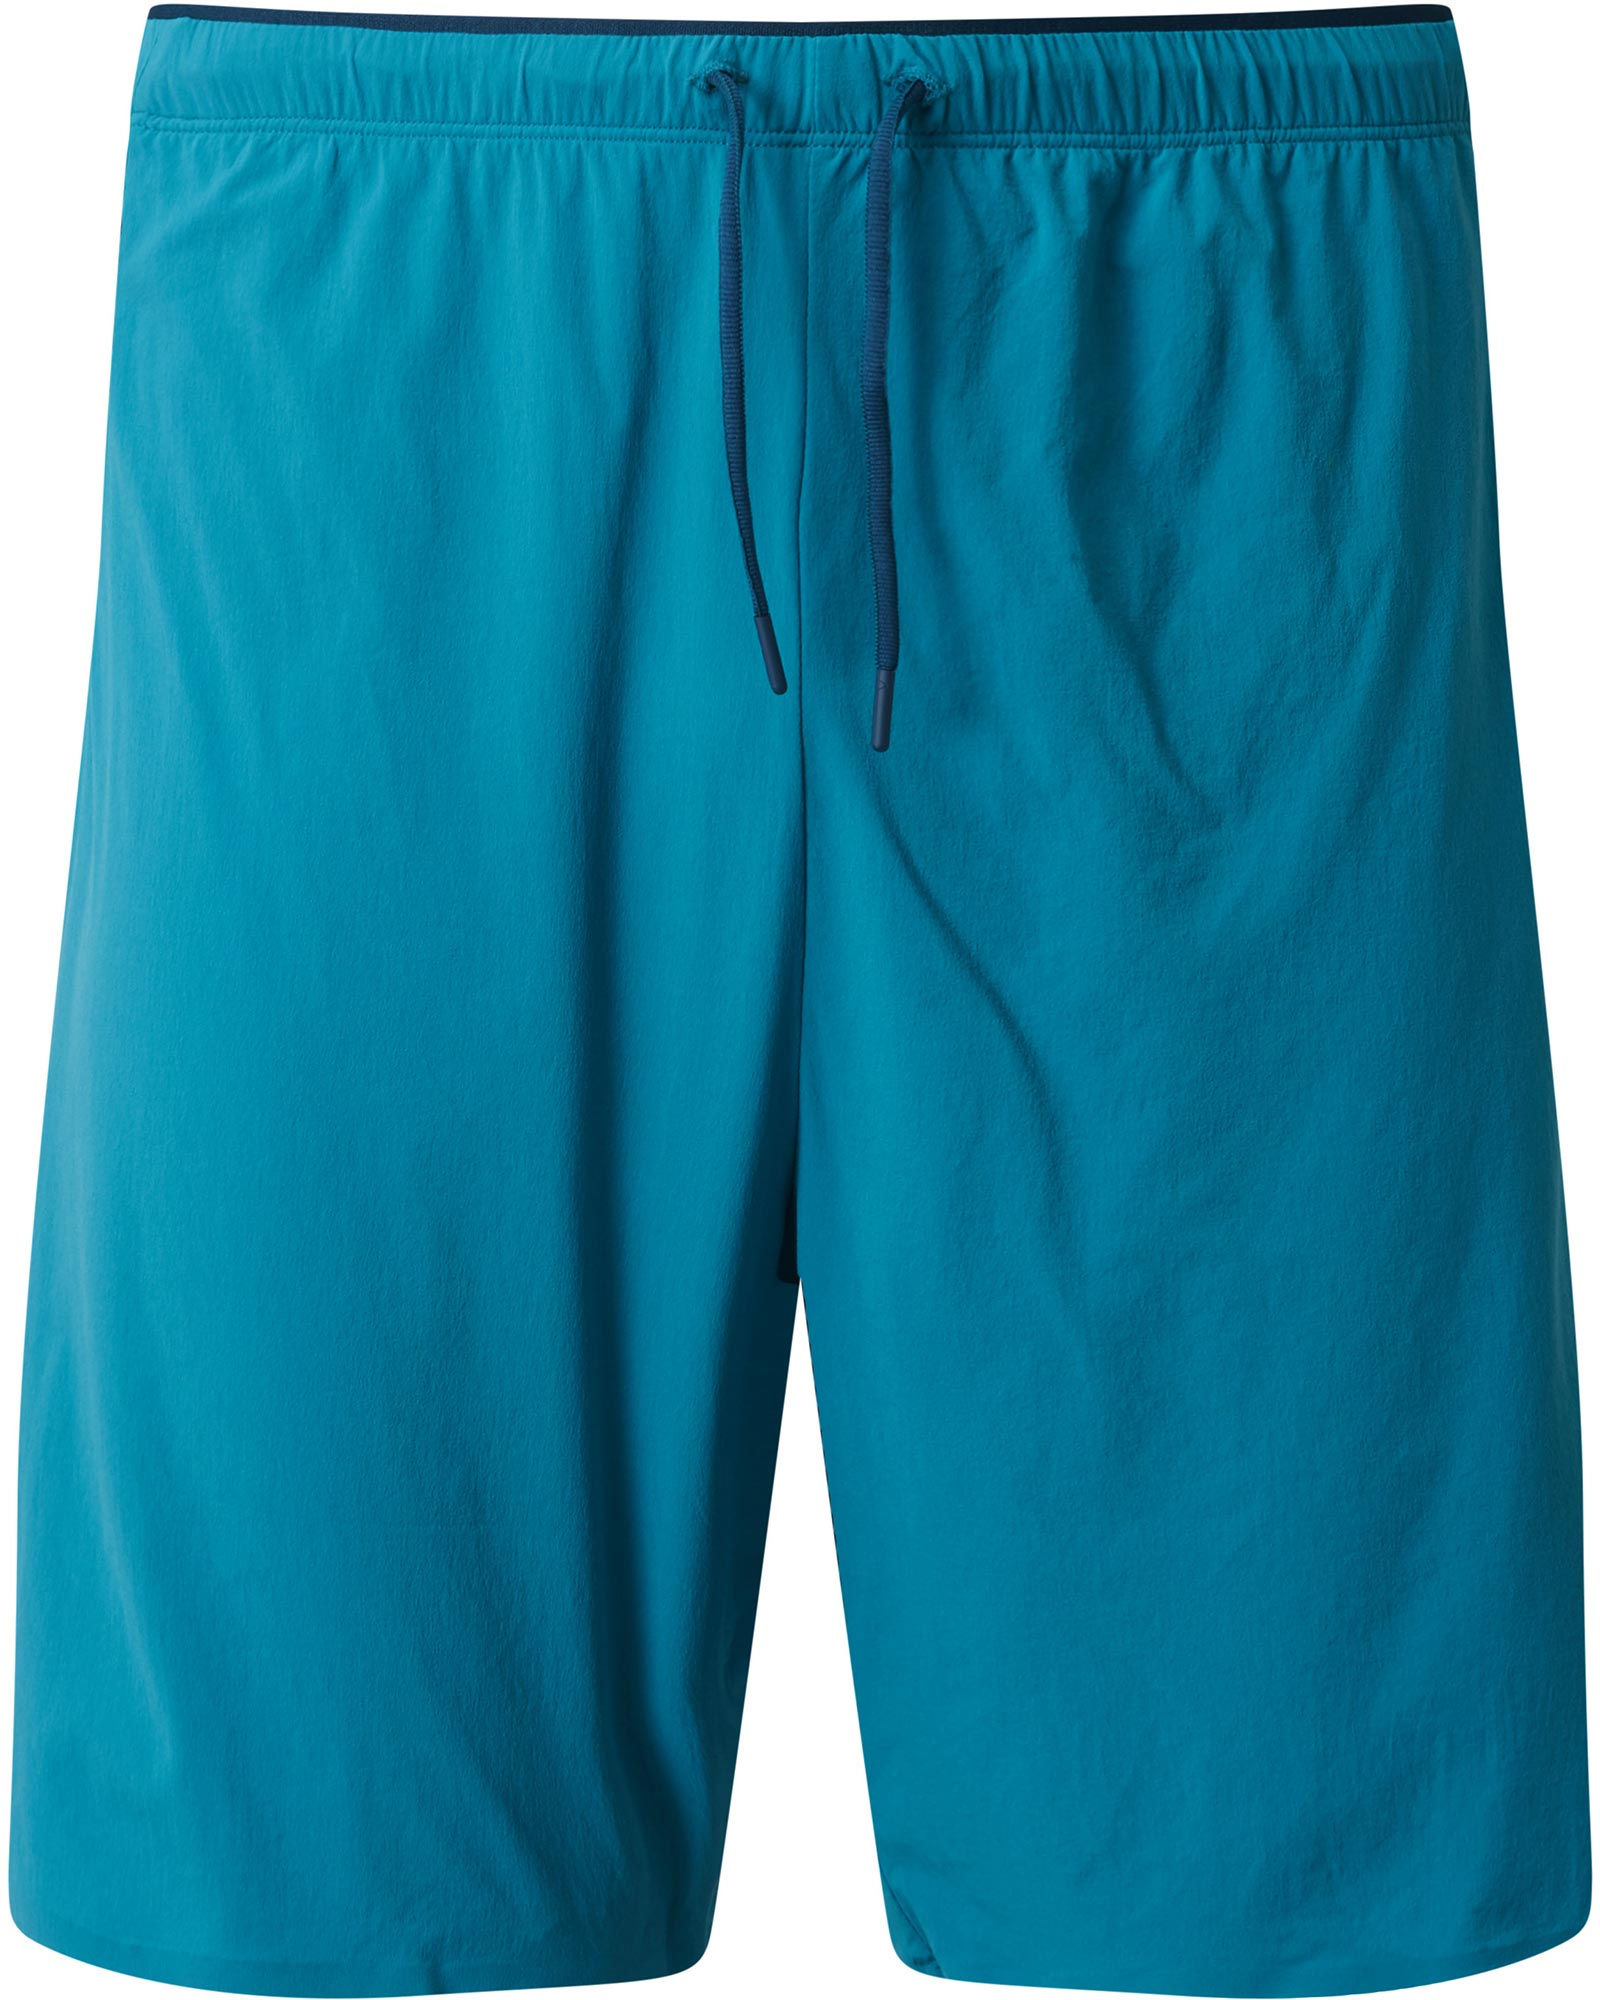 Product image of Rab Men's Talus Shorts